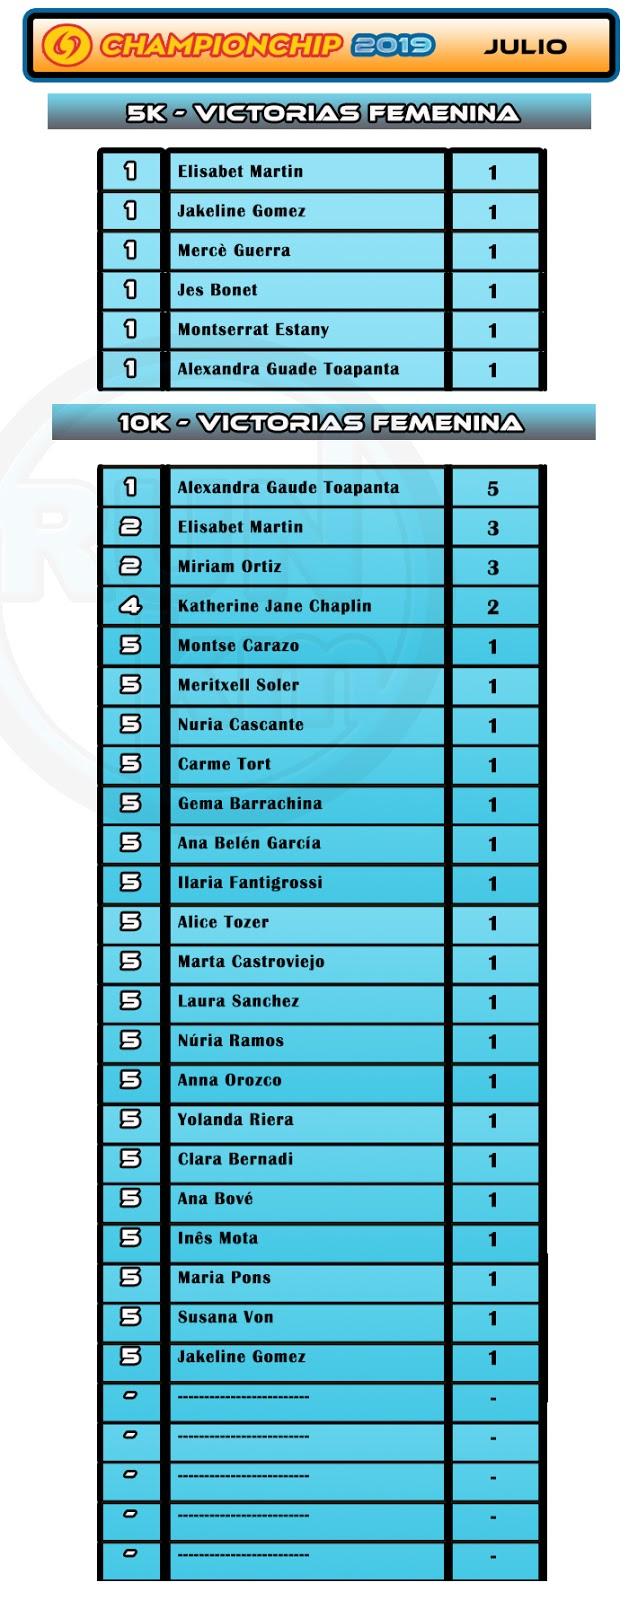 Ranking Victorias Femenina  - Lliga Championchip 2019 - Julio